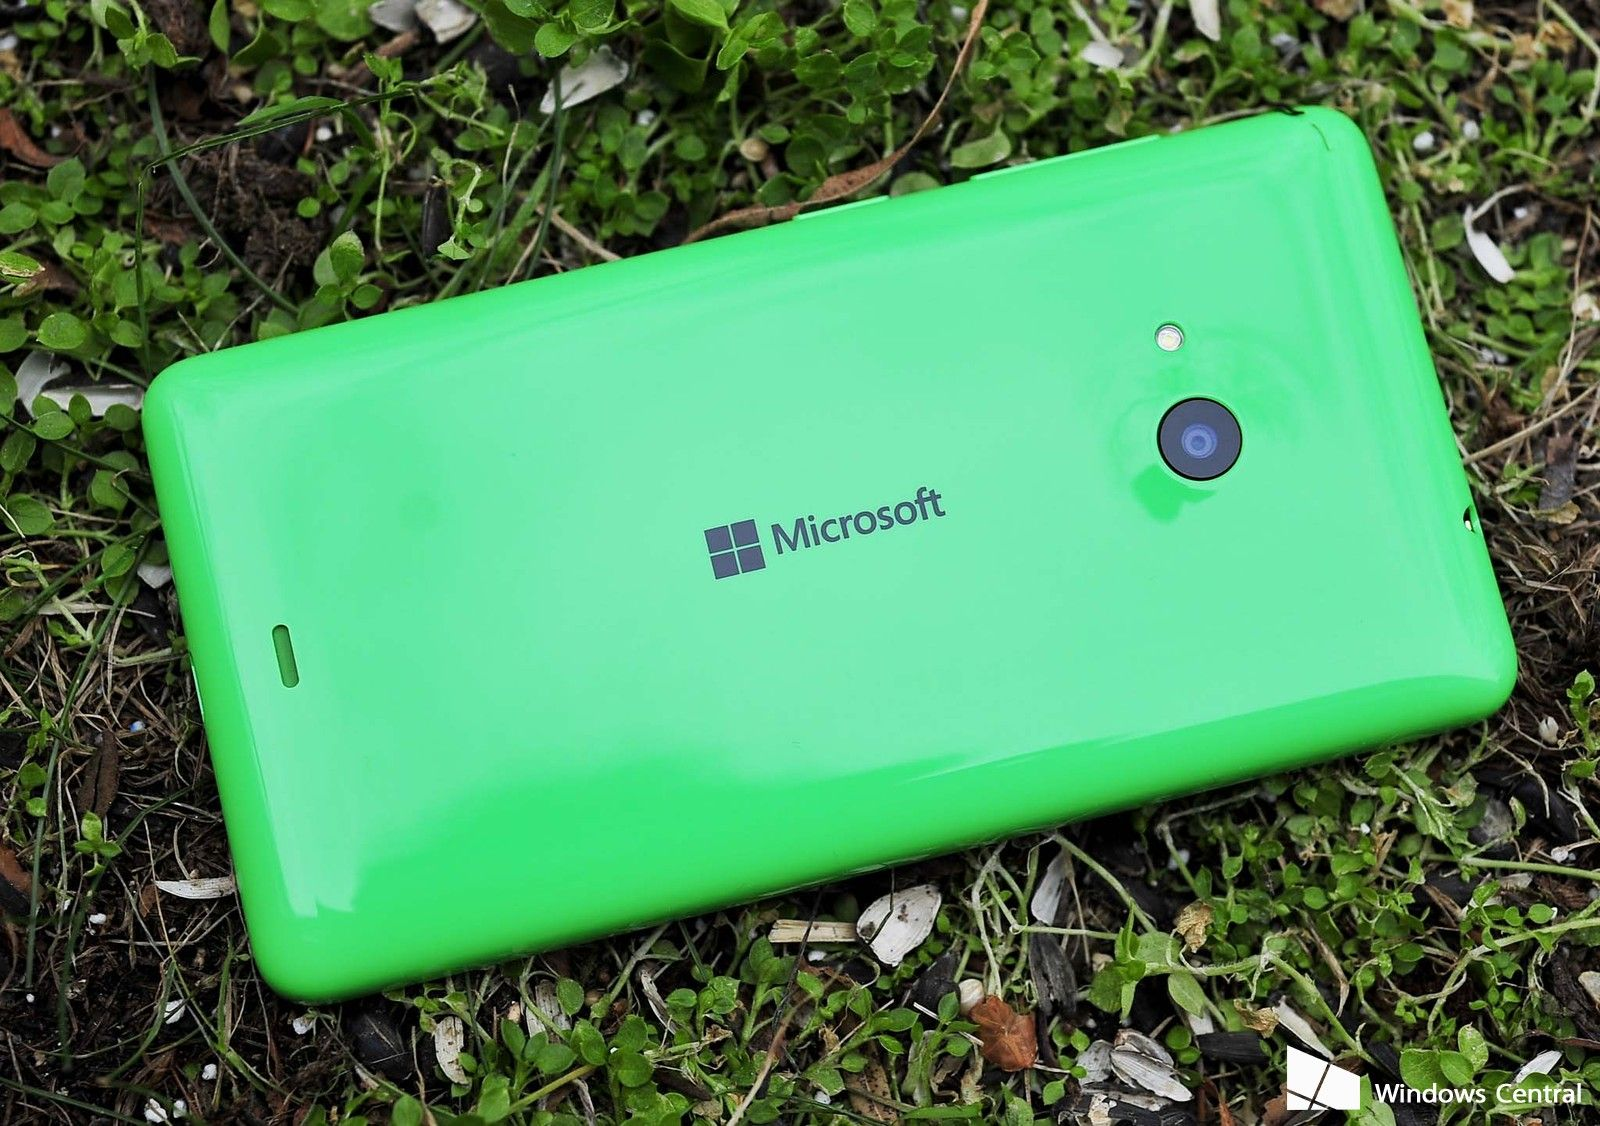 Lumia 640 windows 10 mobile experience on the web windows central -  Cityman Quad Hd Microsoft Lumia Exposed In Adduplex Report Static Market Share For Windows Phone